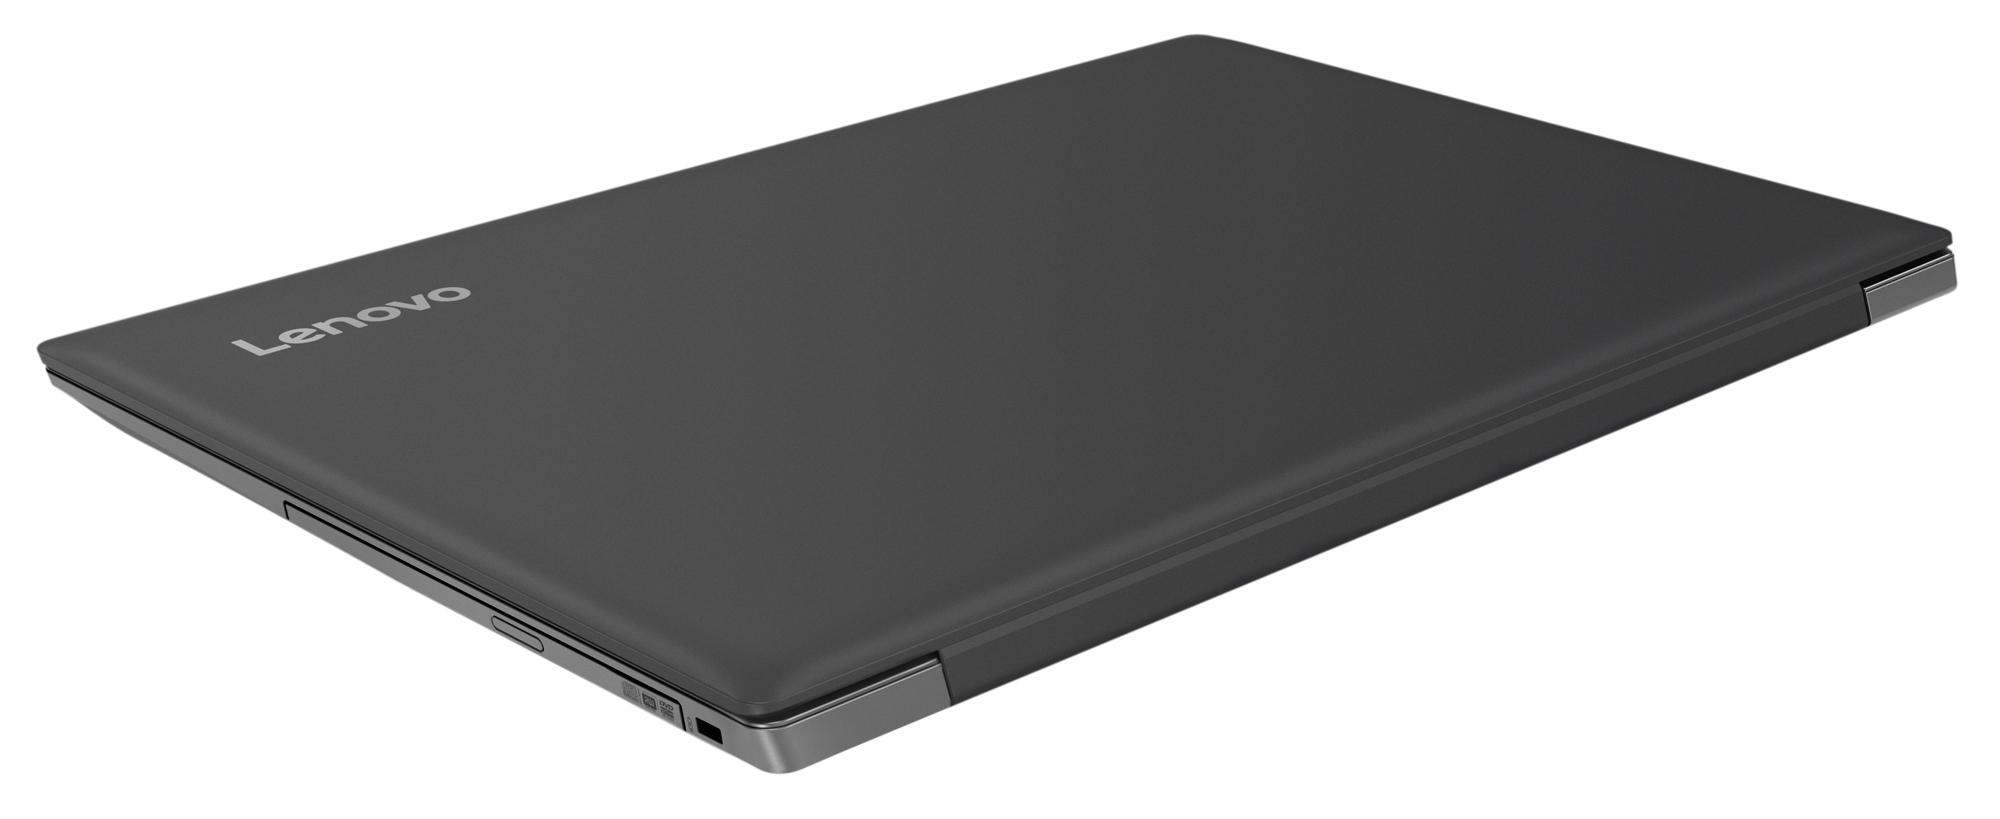 Фото  Ноутбук Lenovo ideapad 330-15 Onyx Black (81DC00QYRA)